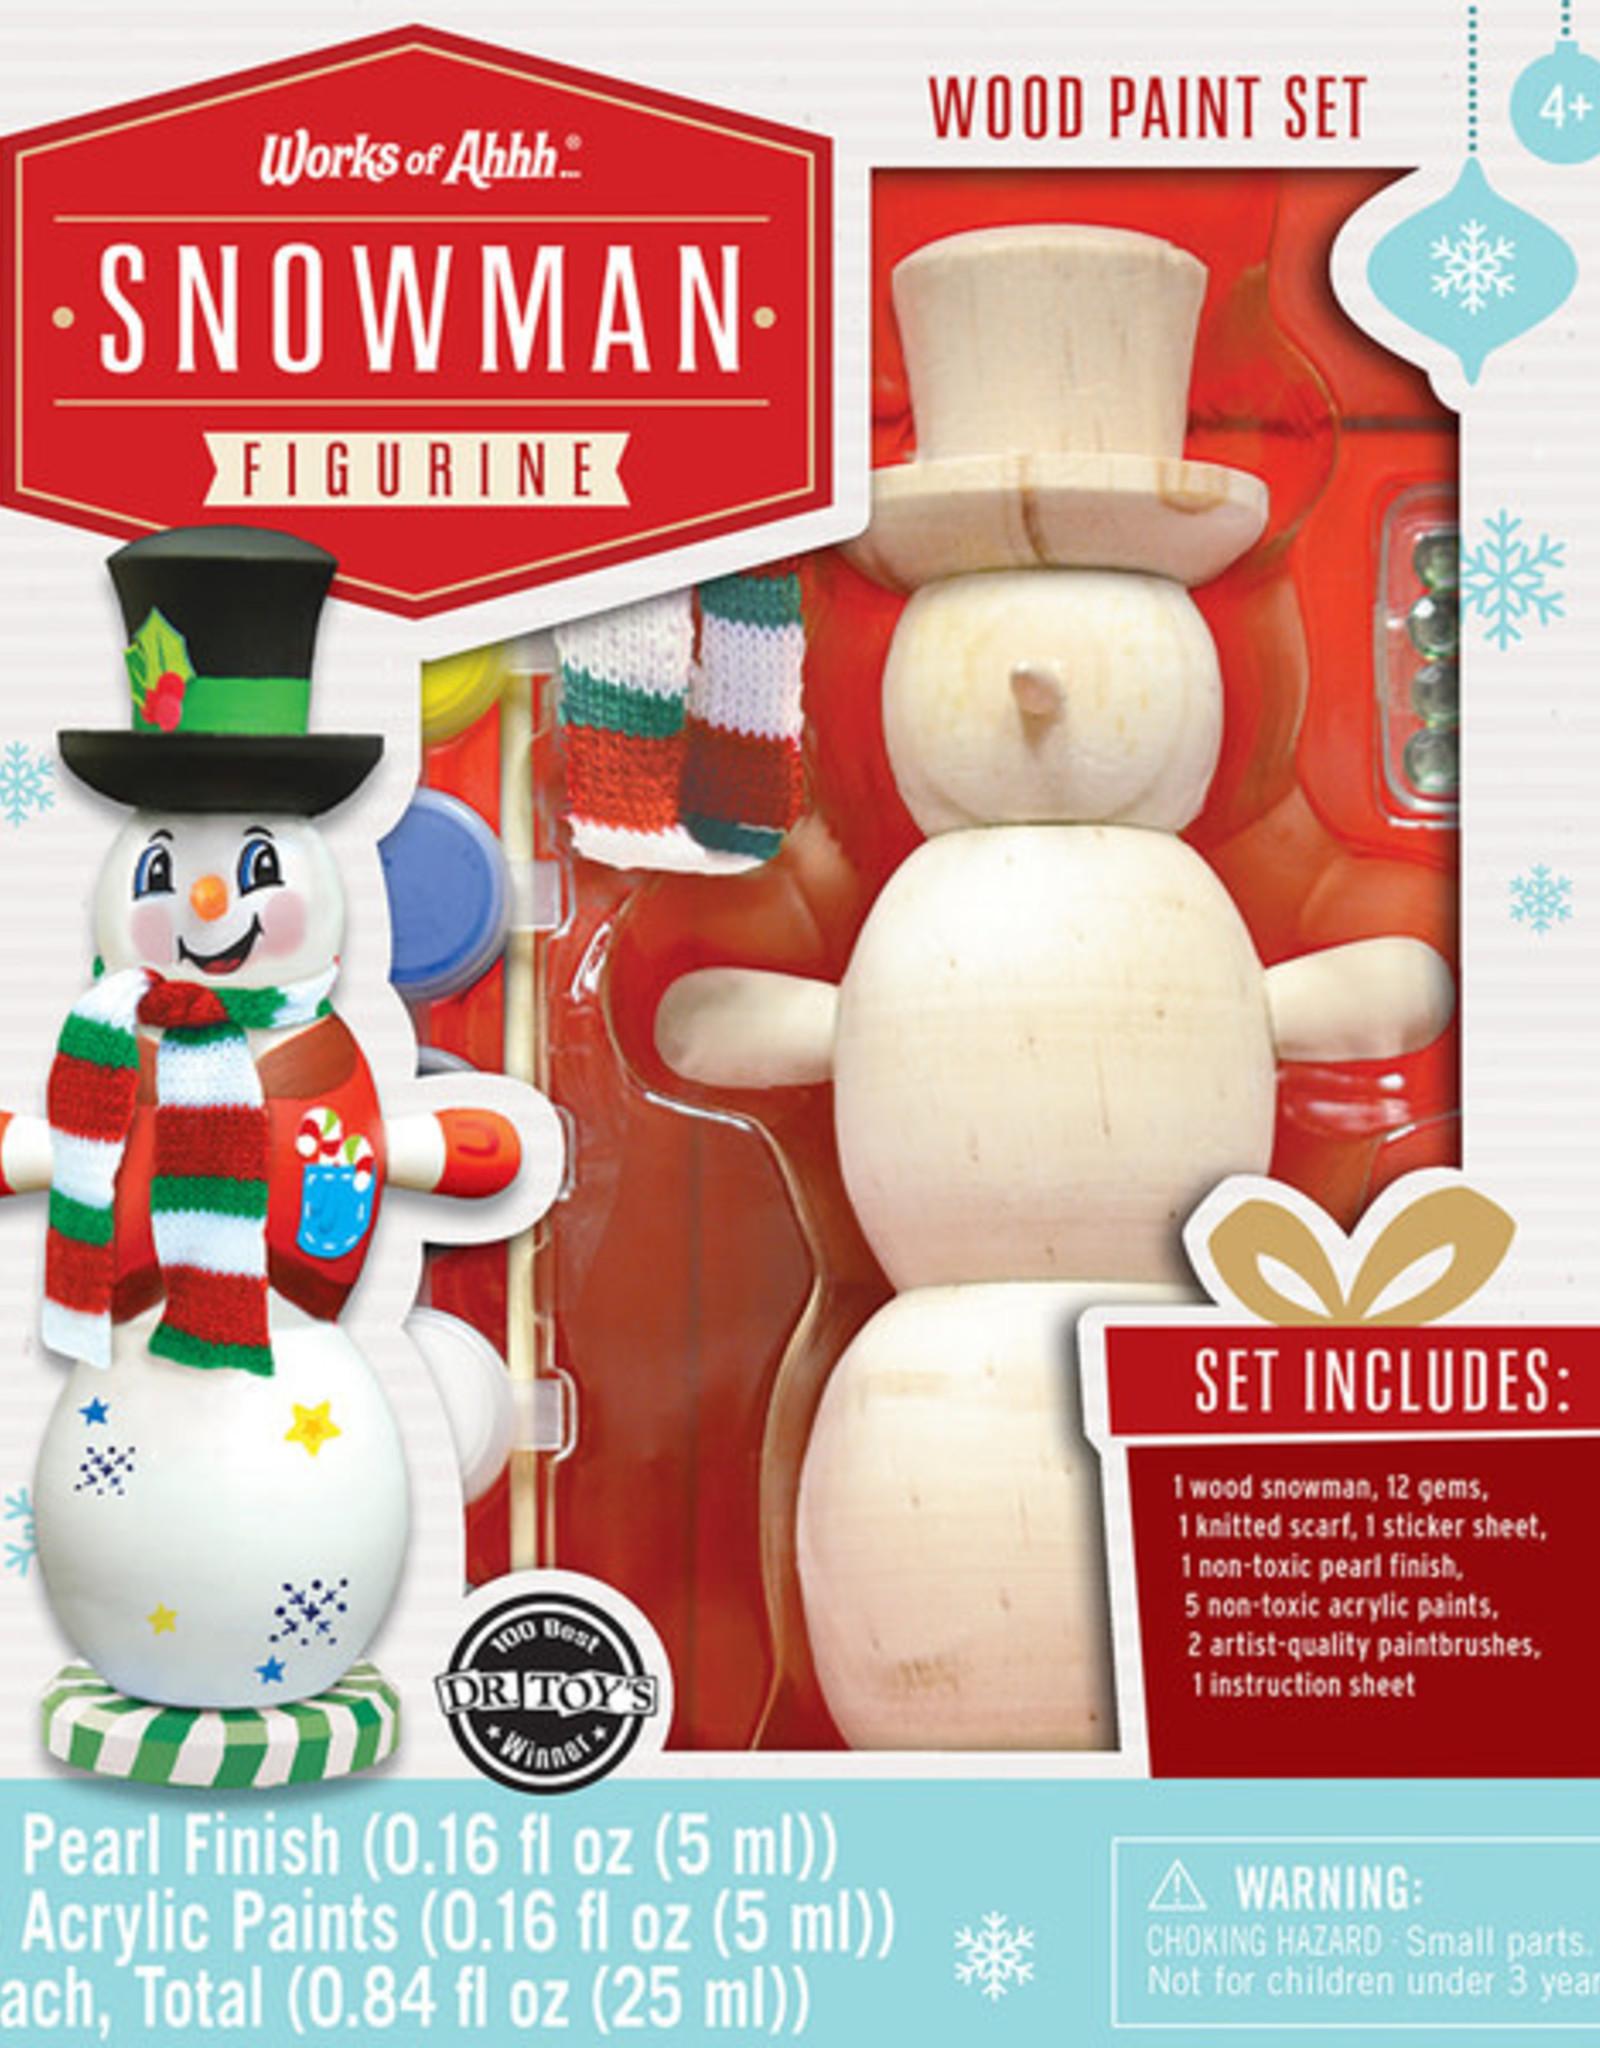 Works of Ahhh Paint Kit Snowman